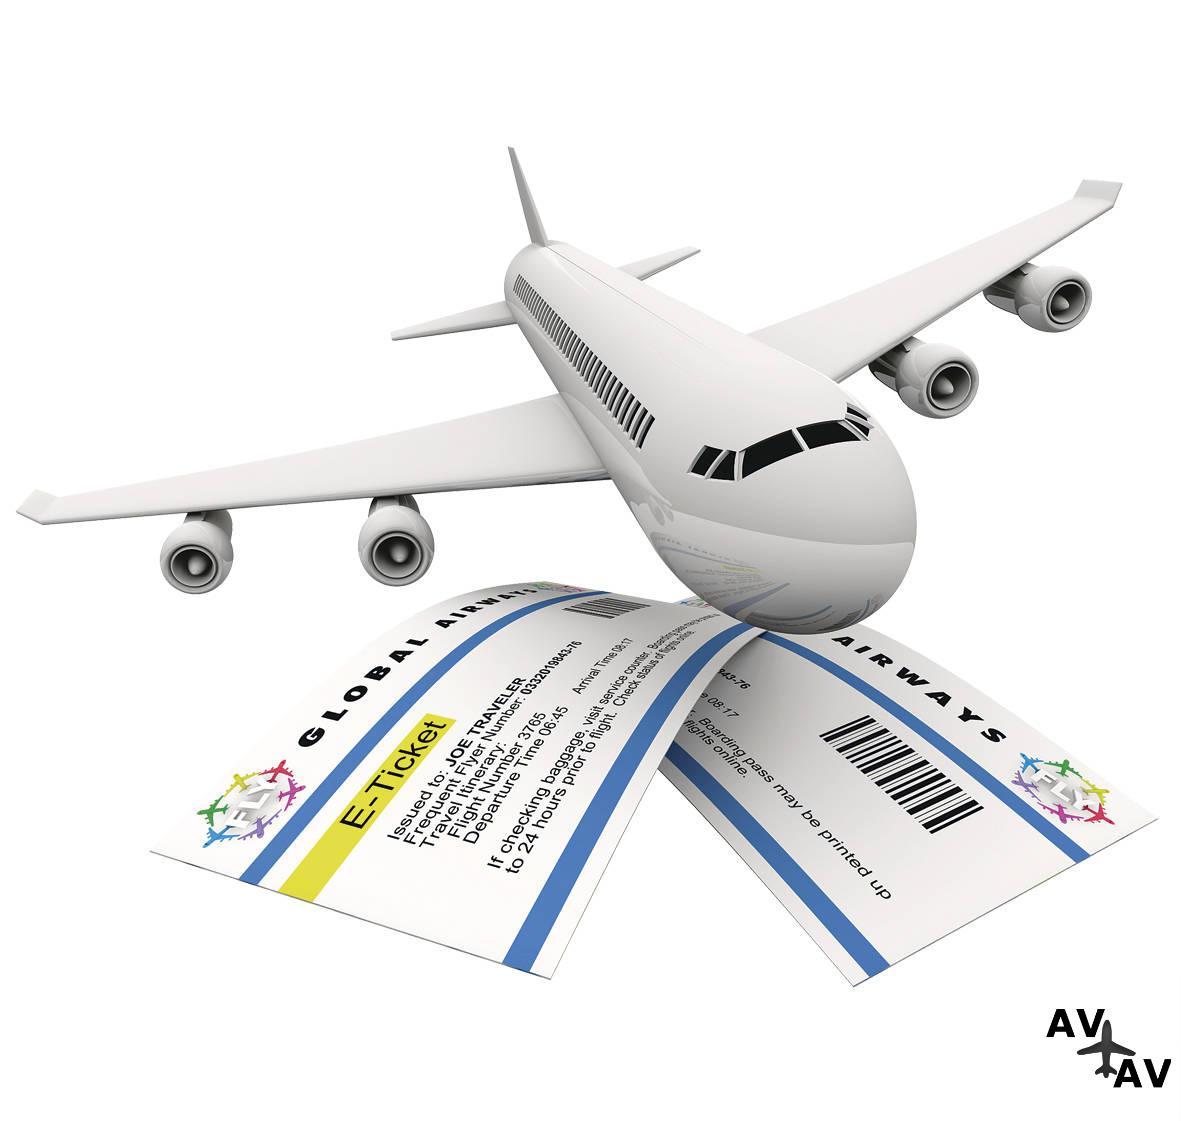 Авиабилеты со скидкой от Air Canada